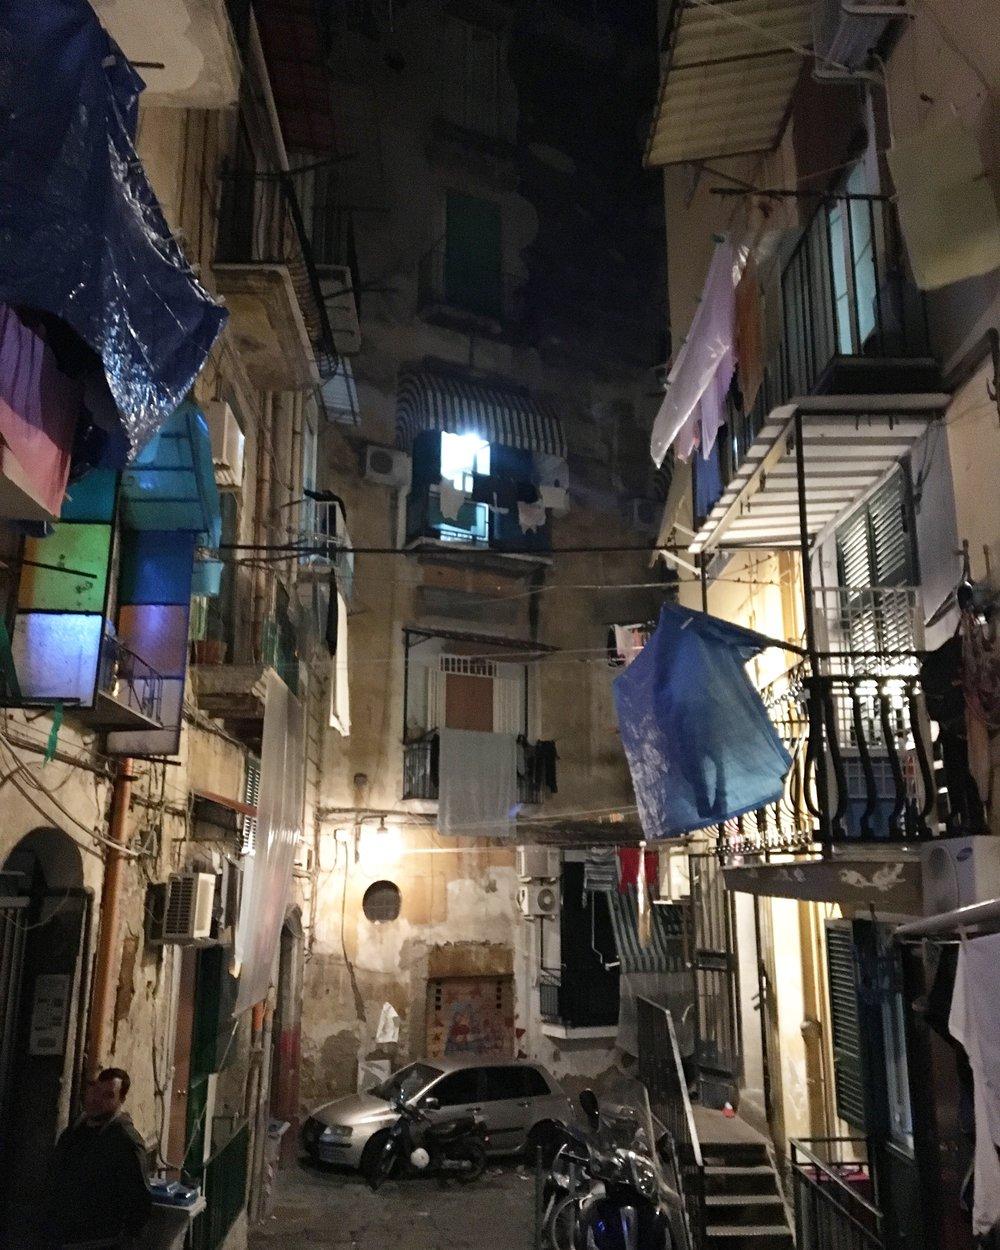 Quartiere Spagnoli - my fav